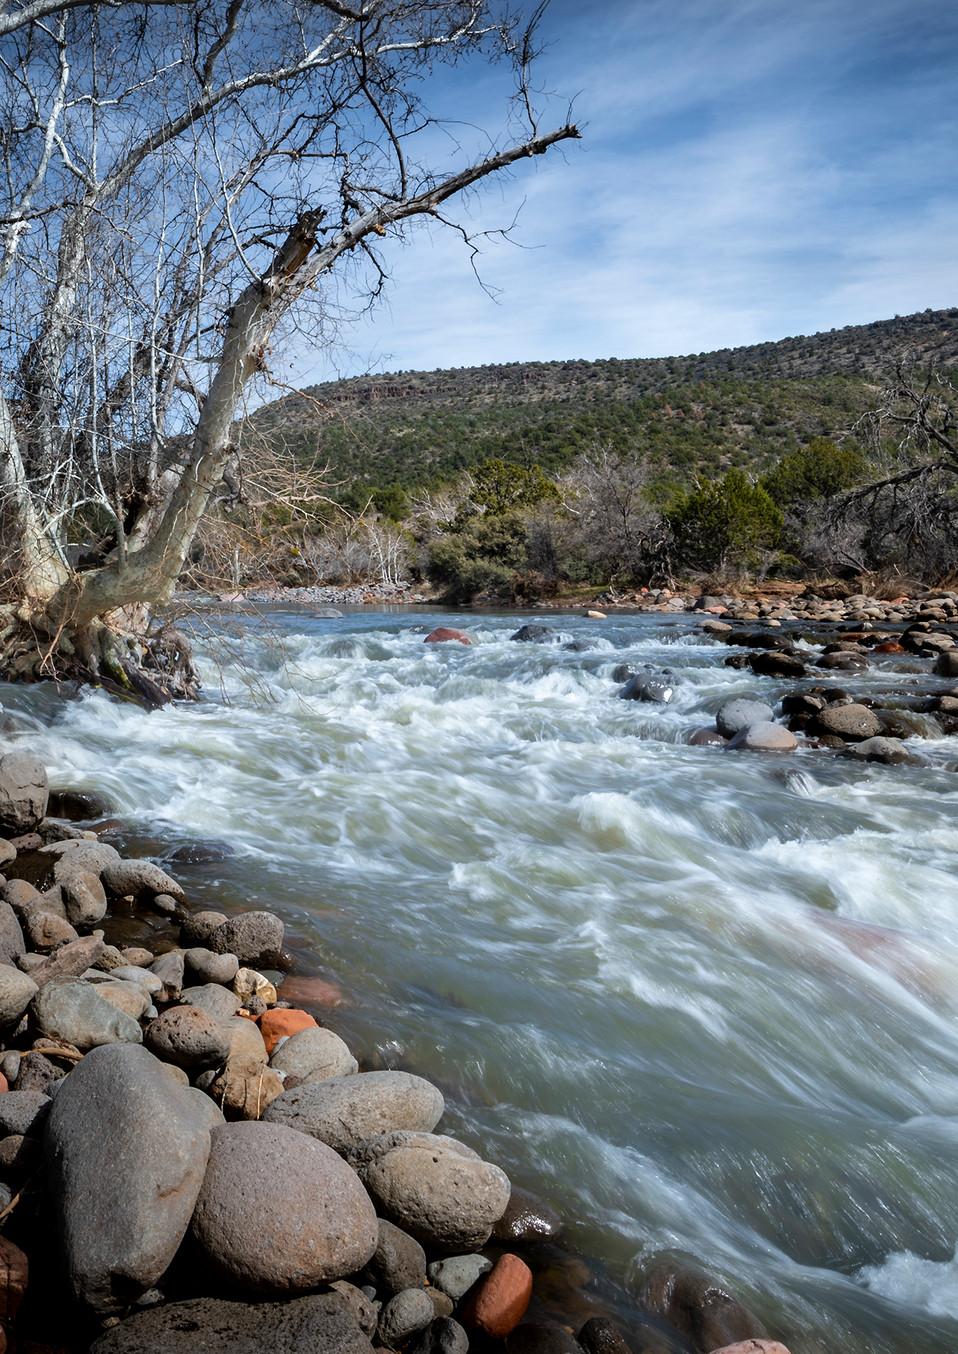 An Arizona river